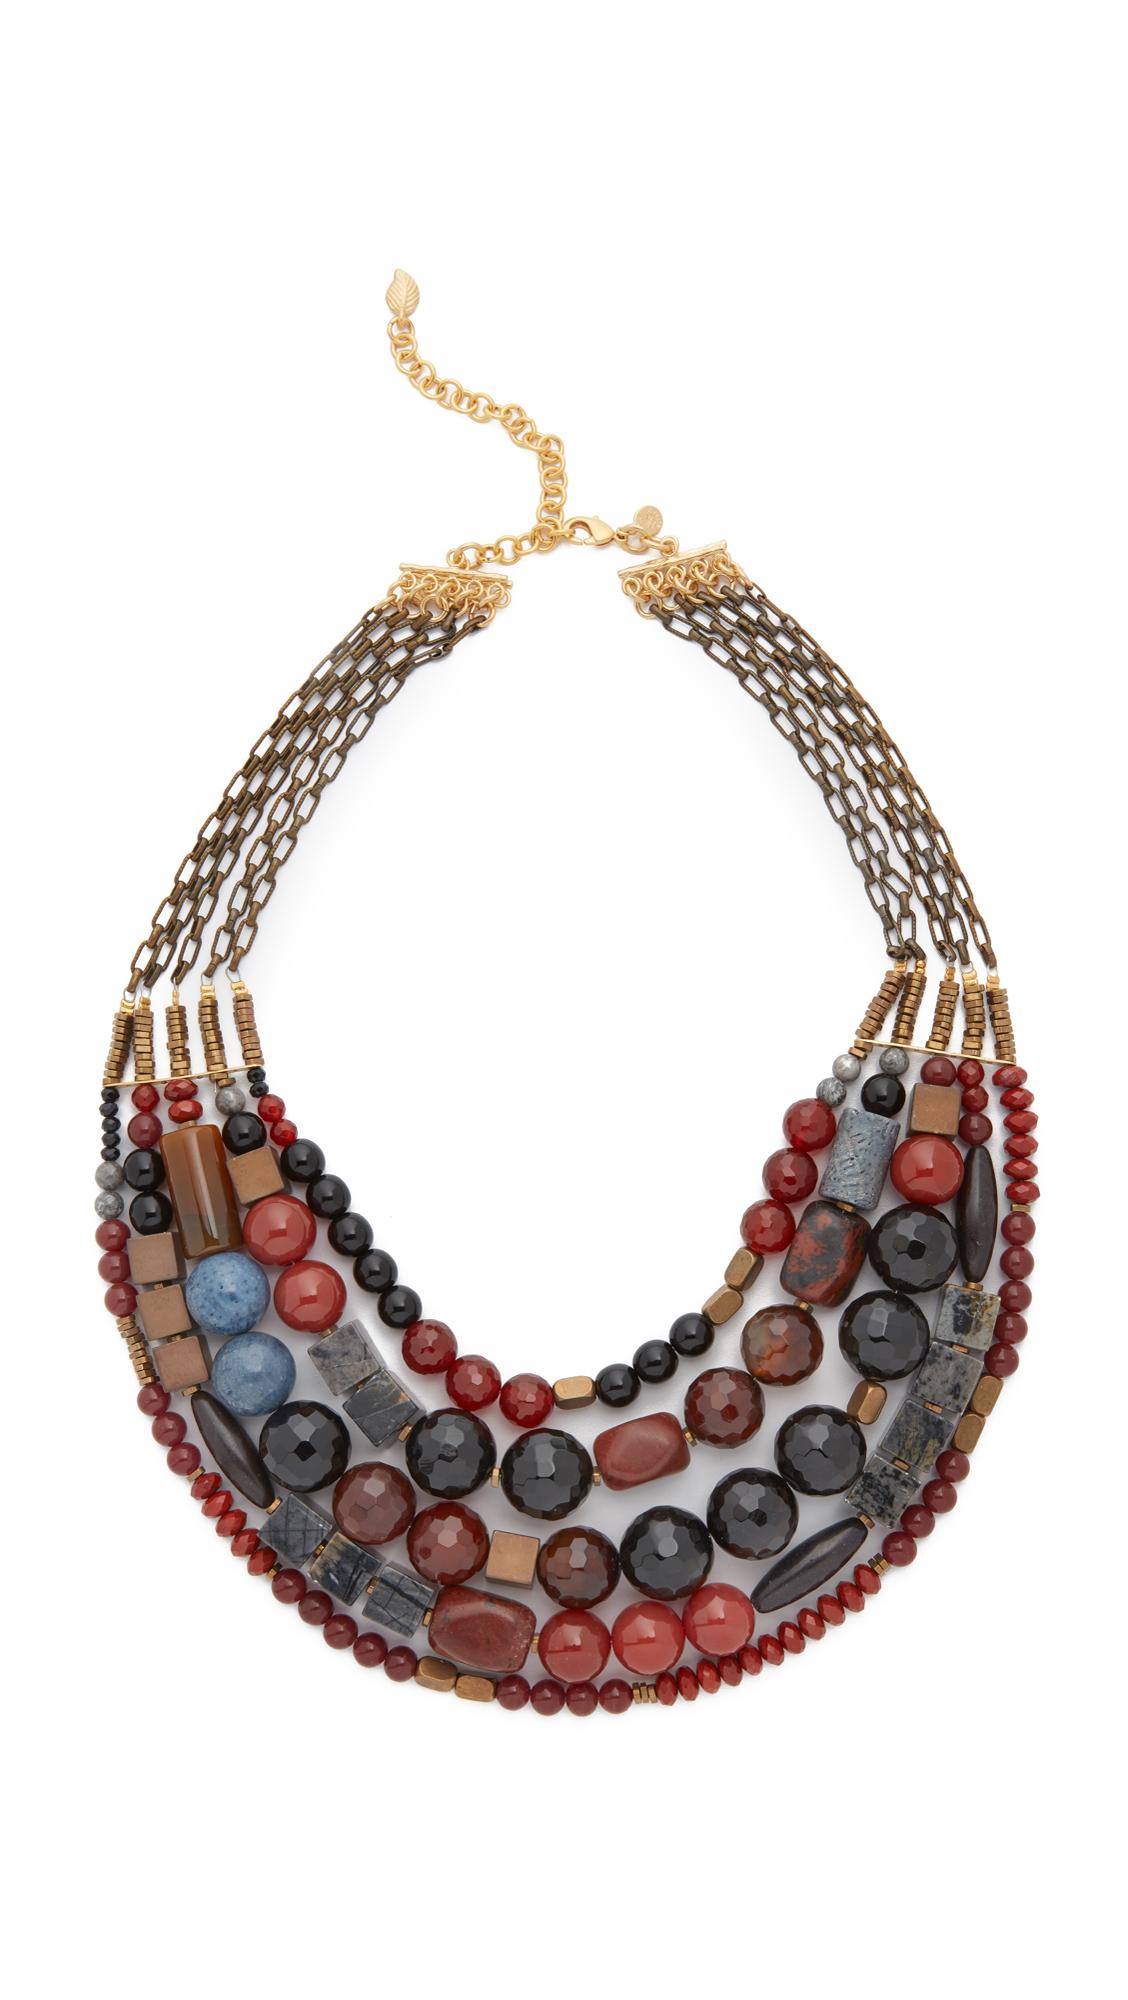 David Aubrey Hailey Layered Necklace - Gold Multi